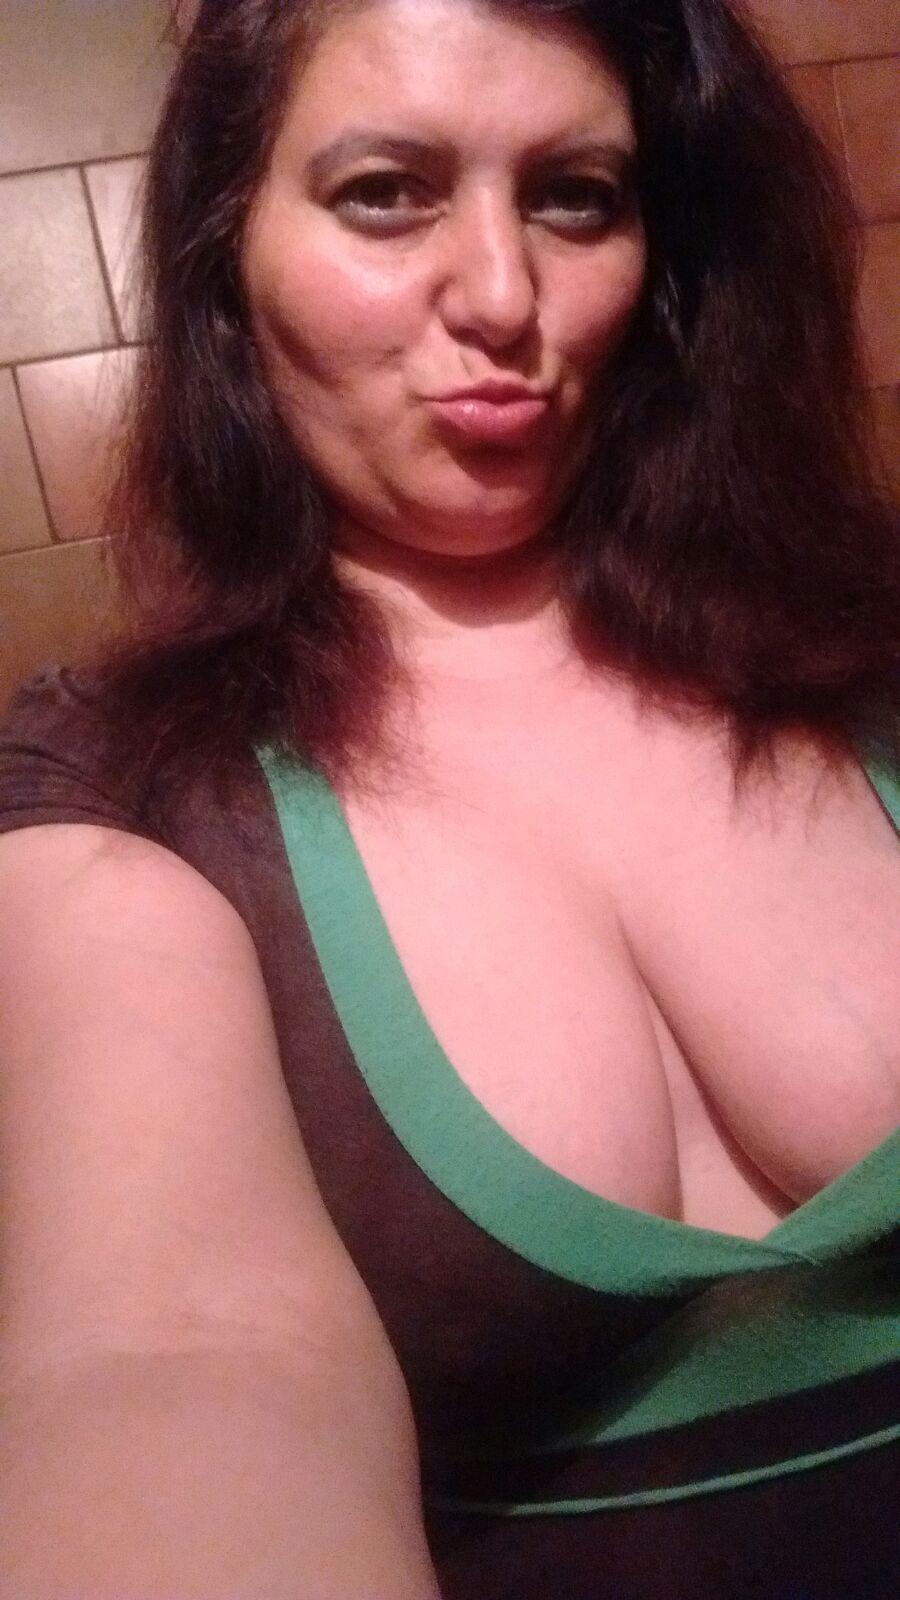 prostitutas maduras coruña prostitutas en coimbra